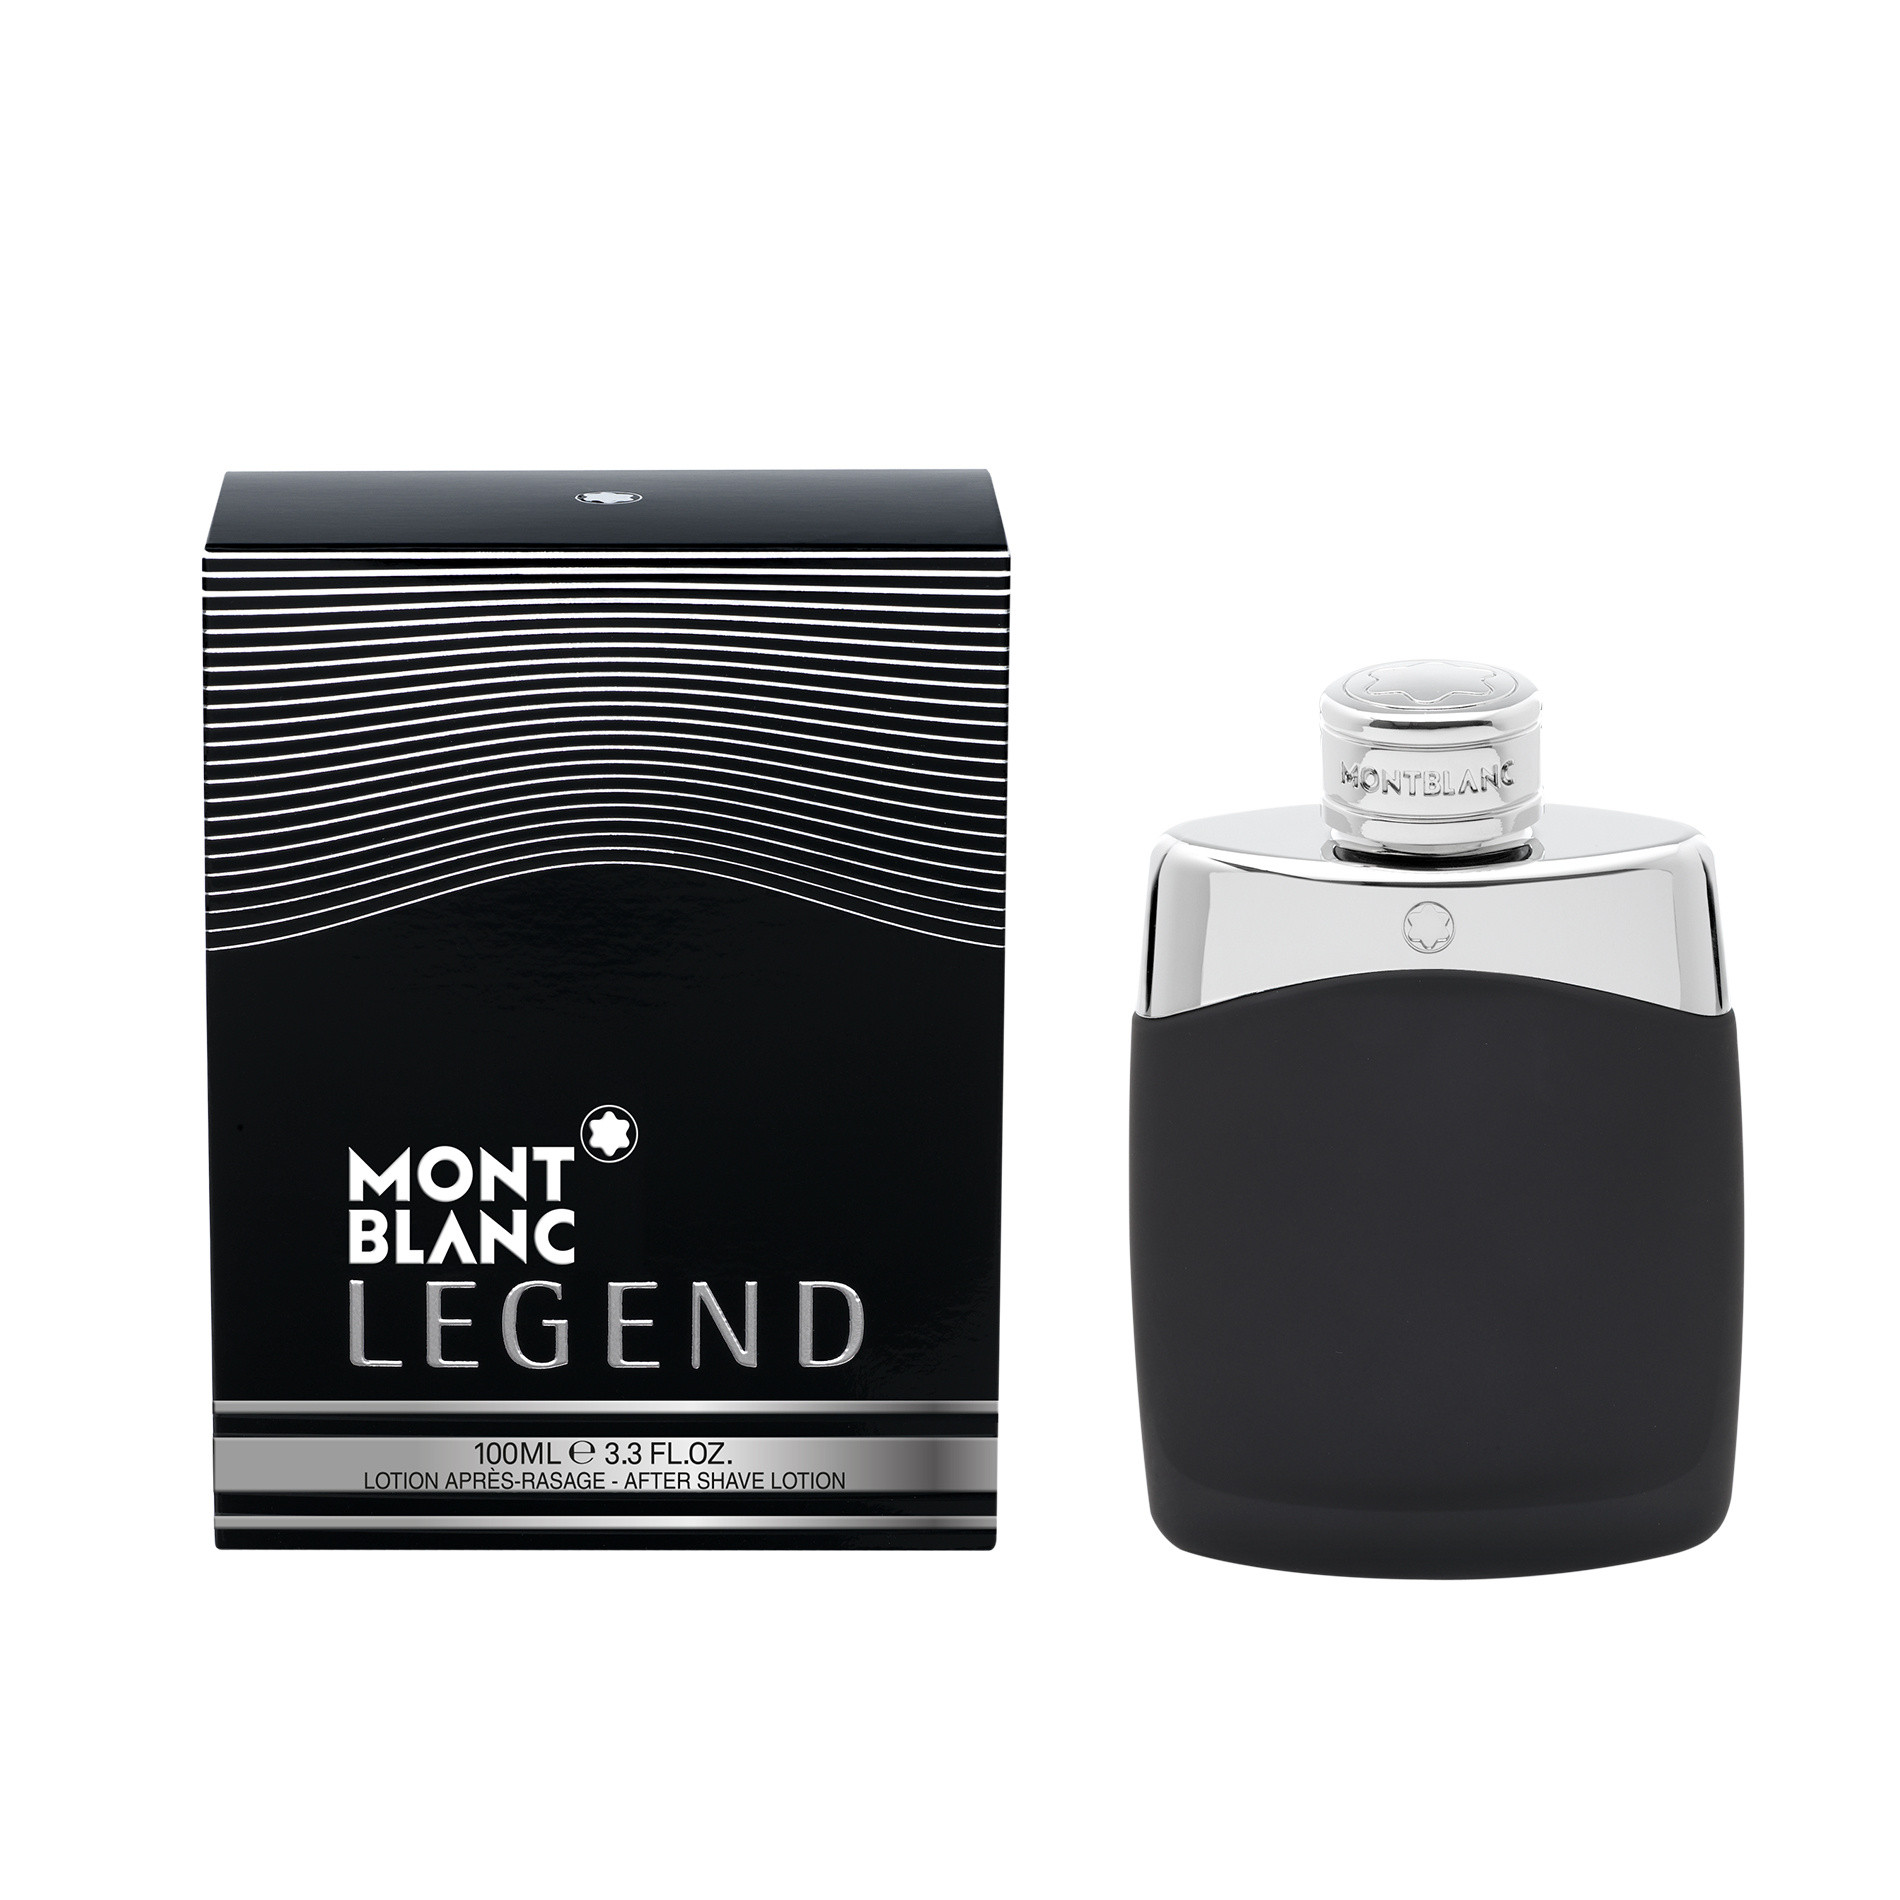 Montblanc Legend After Shave Balm 100 ml, Nero, large image number 0